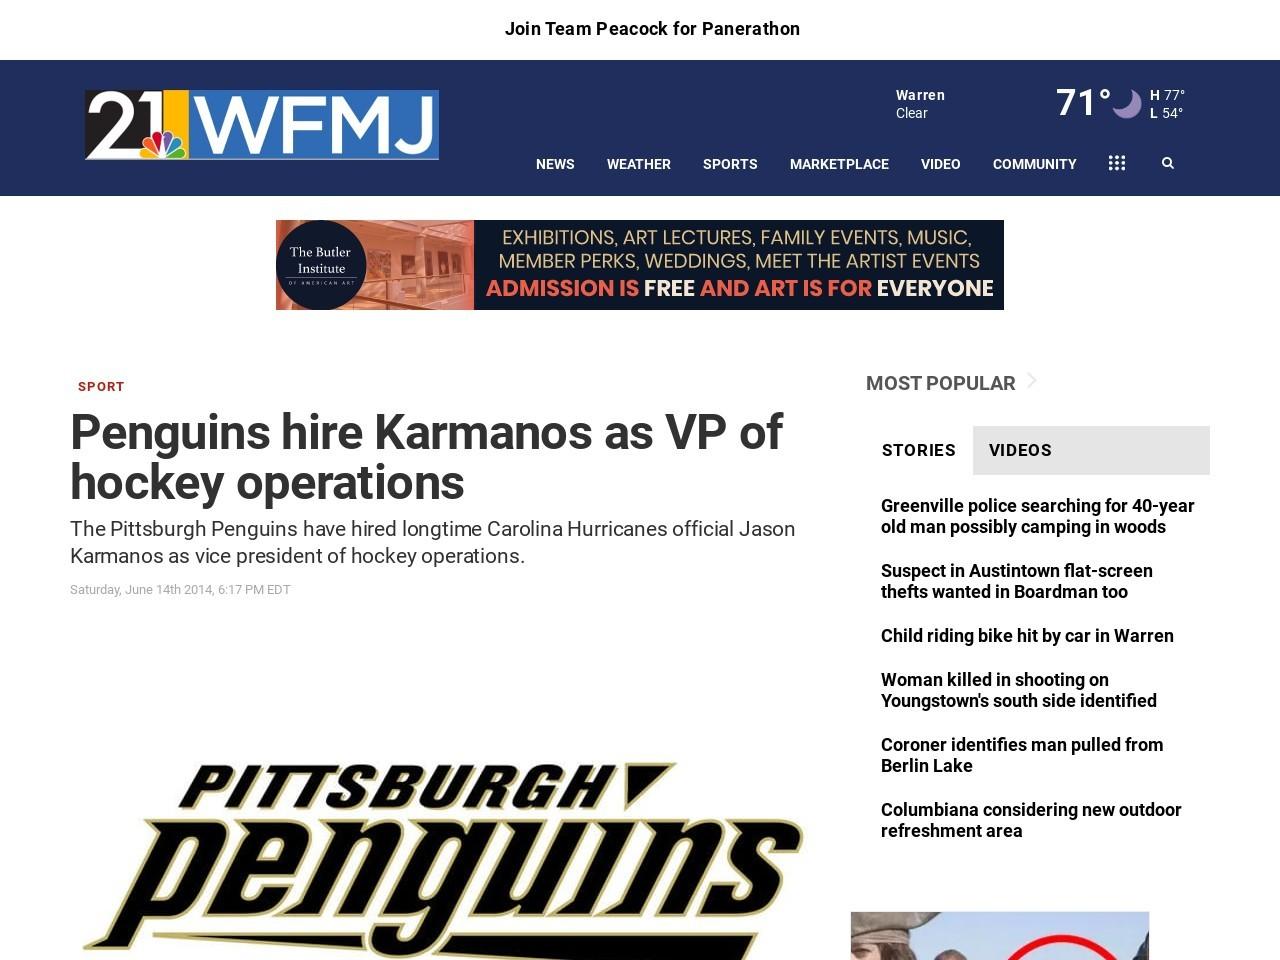 Penguins hire Karmanos as VP of hockey operations